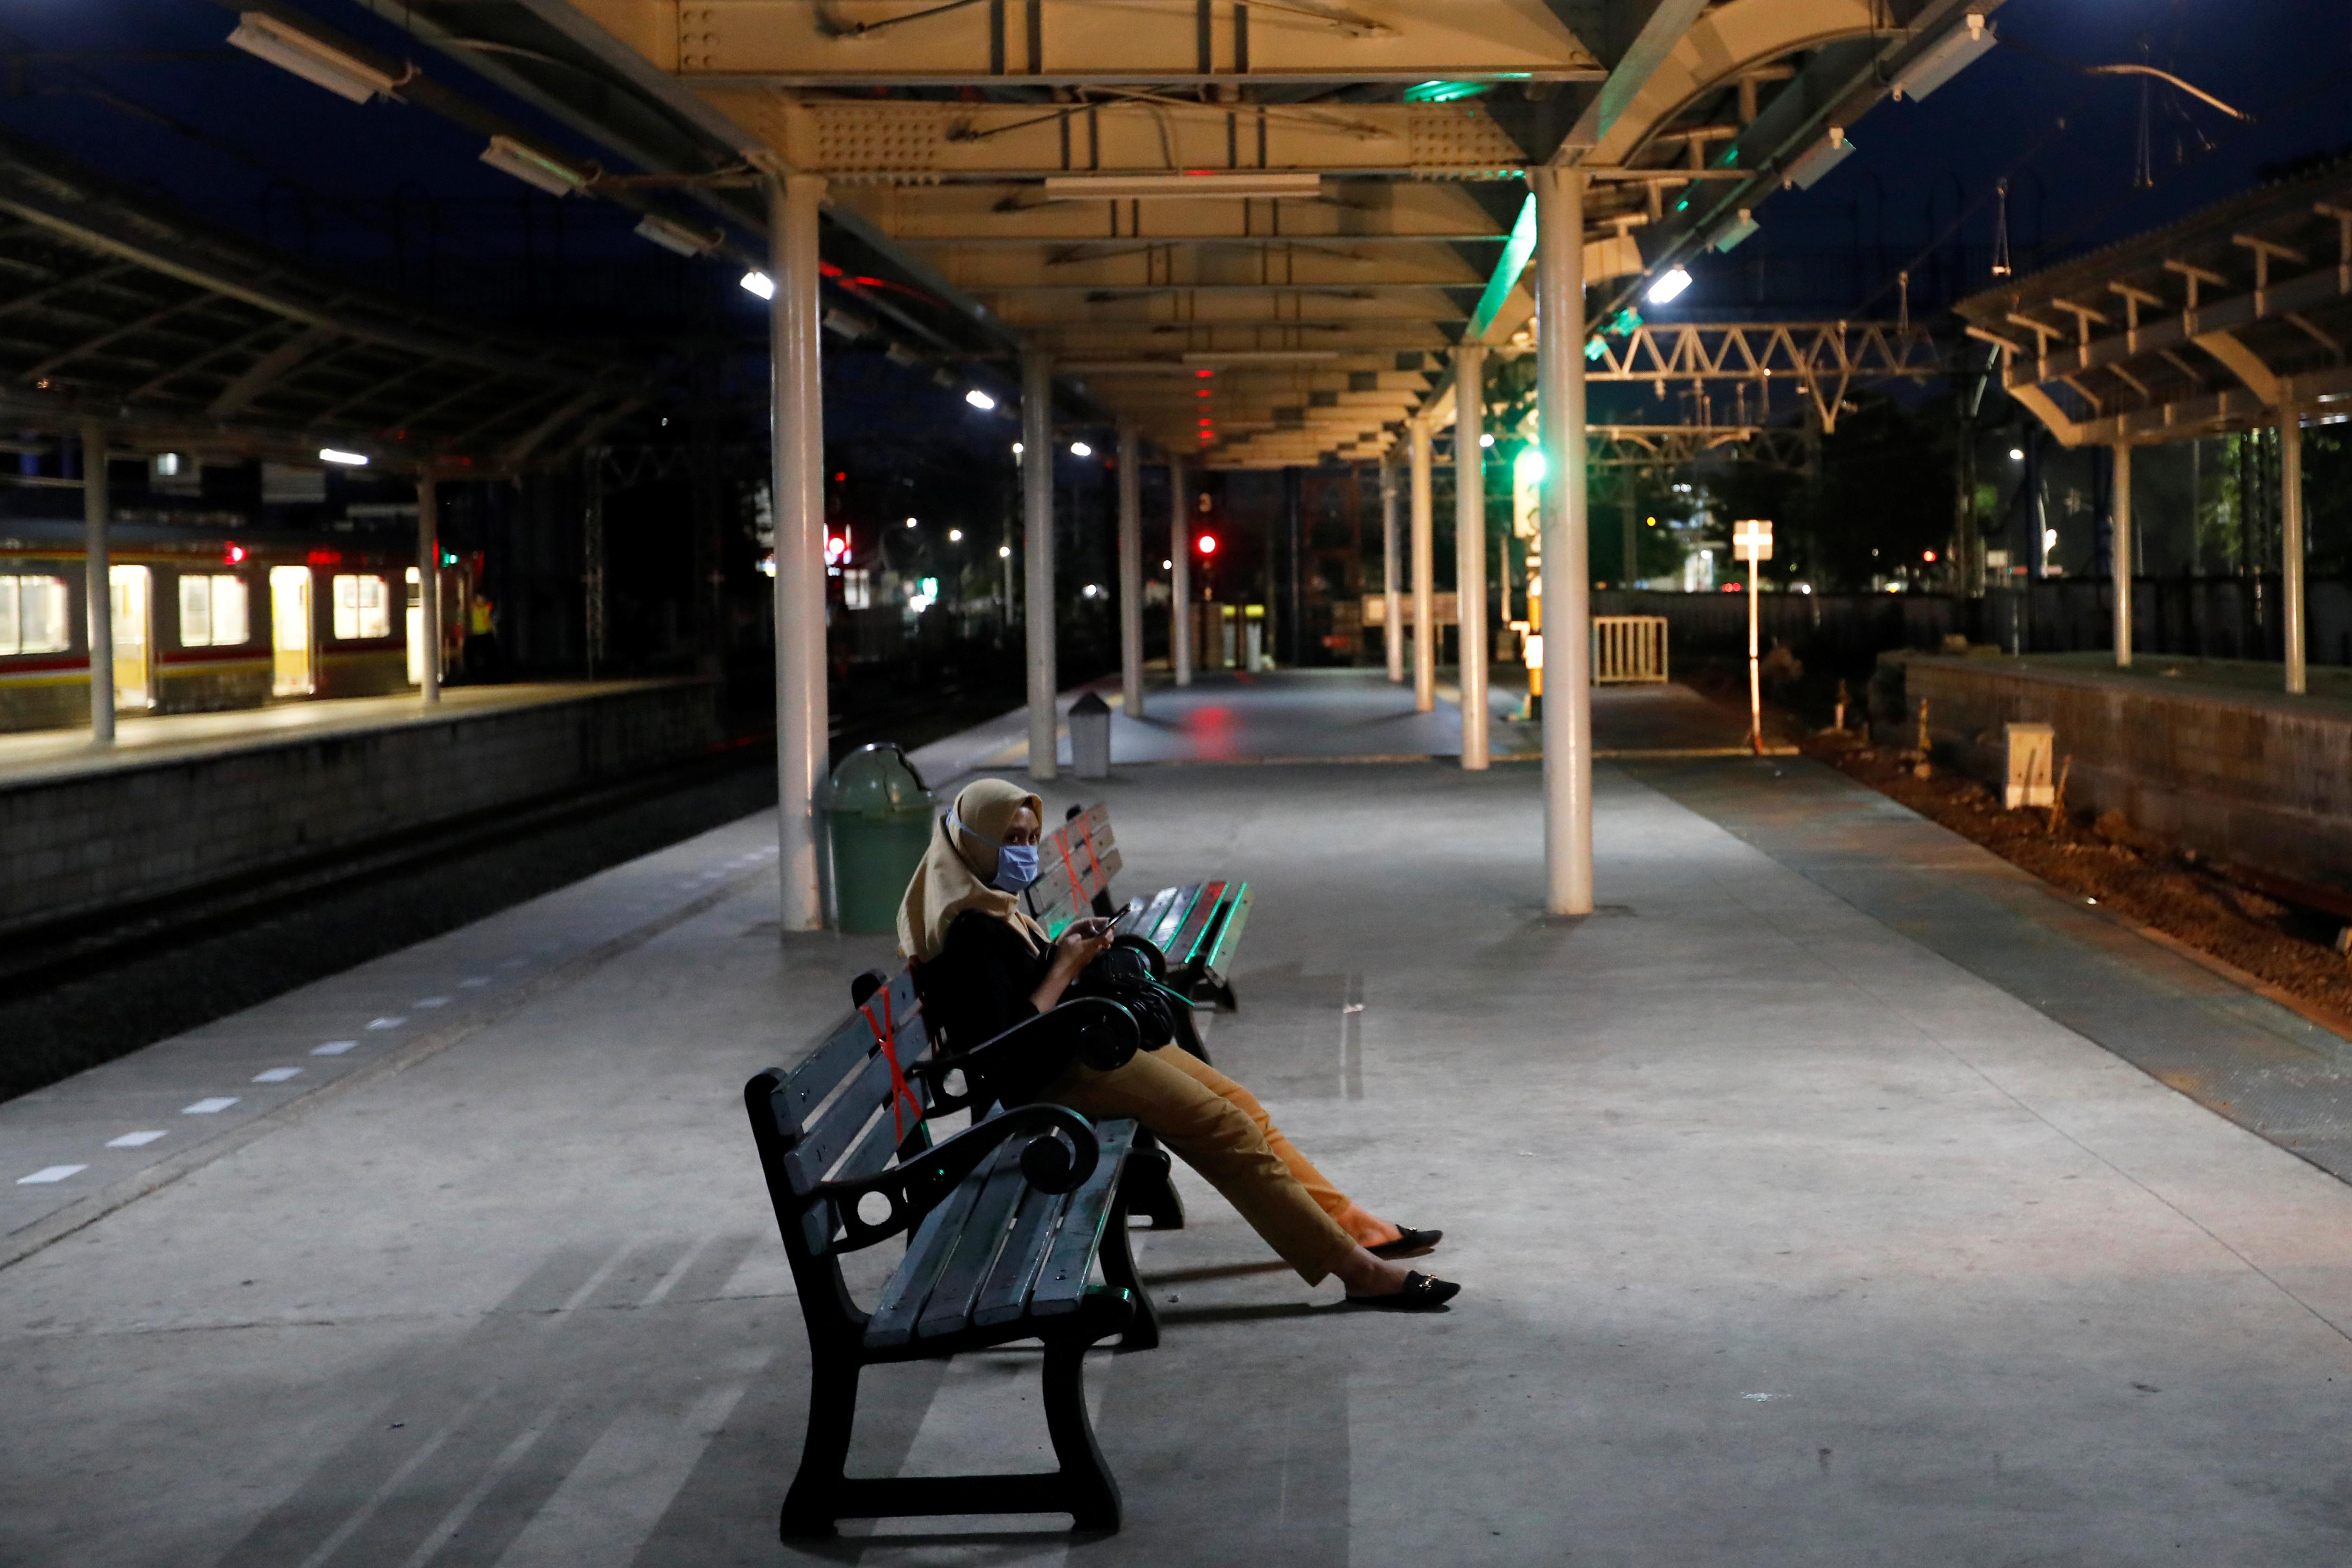 Una mujer espera un tren en Jakarta, Indonesia (REUTERS/Willy Kurniawan)